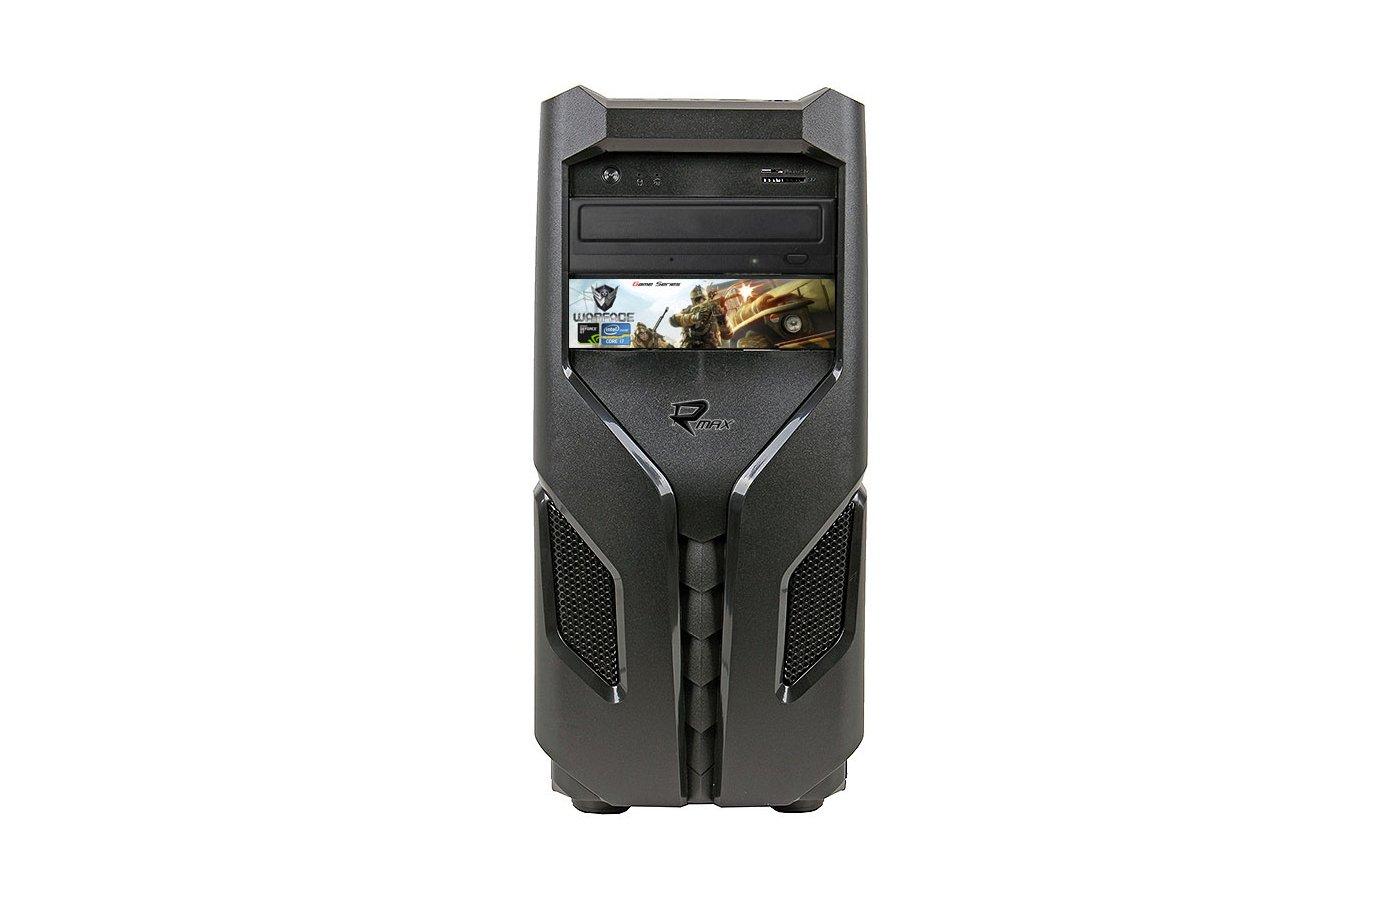 Системный блок Rmax 707 Gaming Pro intel i7 620M 2.6Gh/8Gb/1Tb/R7 360 2Gb/DVDRW/DOS